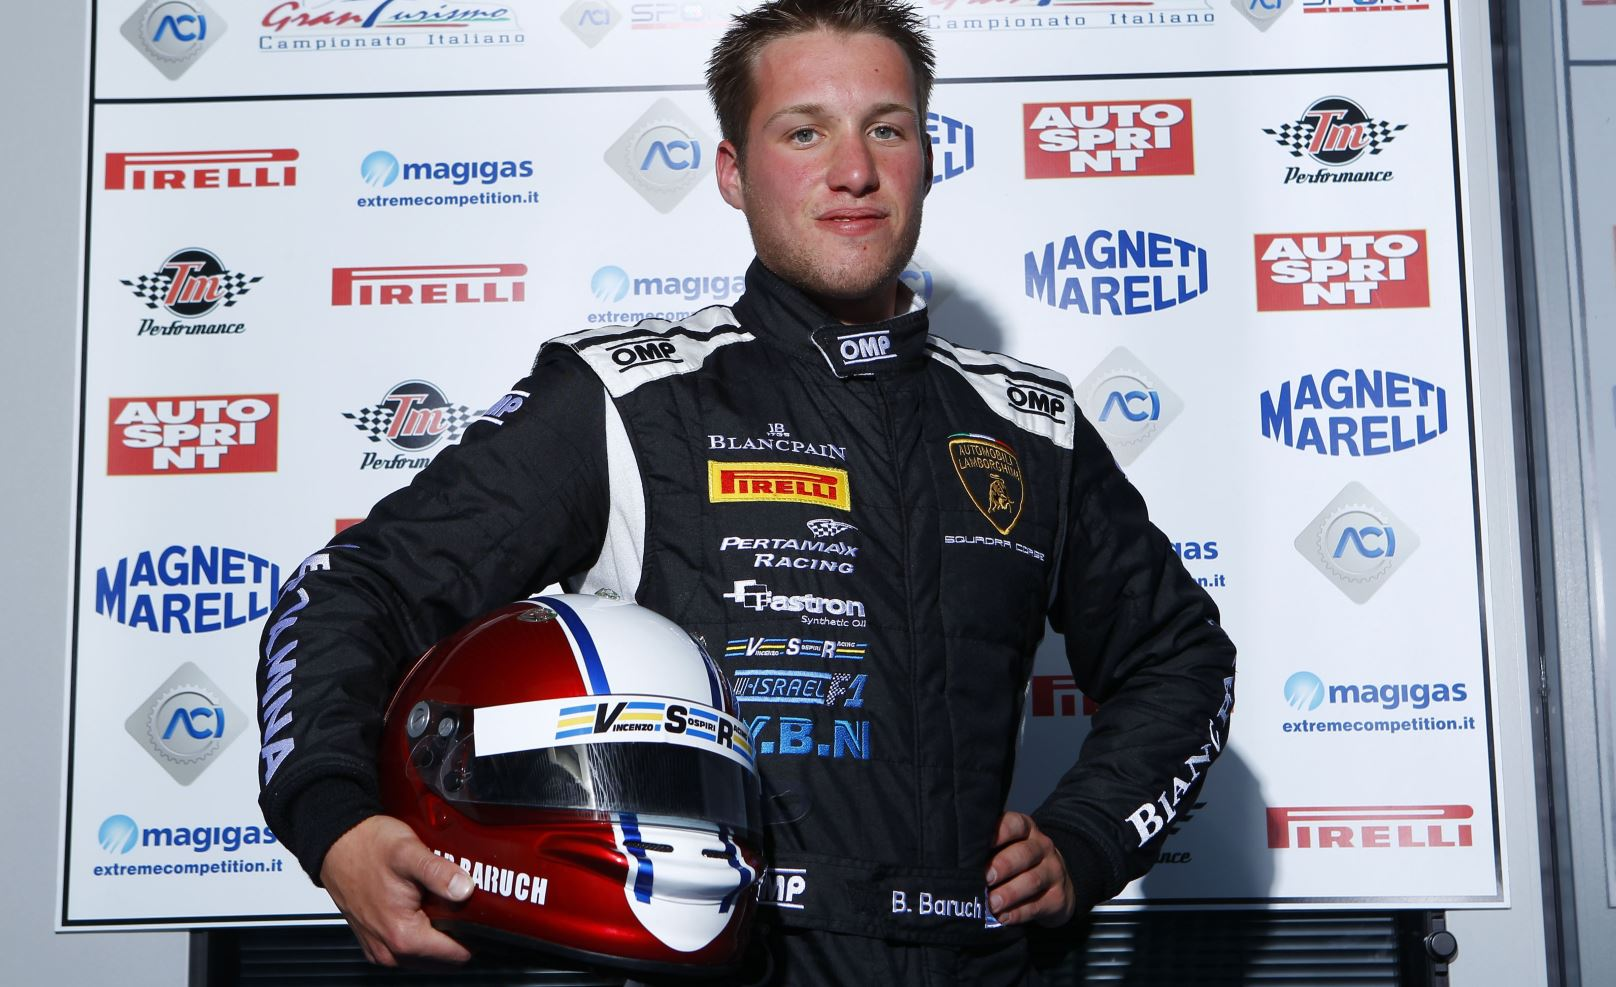 Israeli racecar driver Bar Baruch at the Italian Super GT Cup in 2016. Photo via http://www.acisportitalia.it/